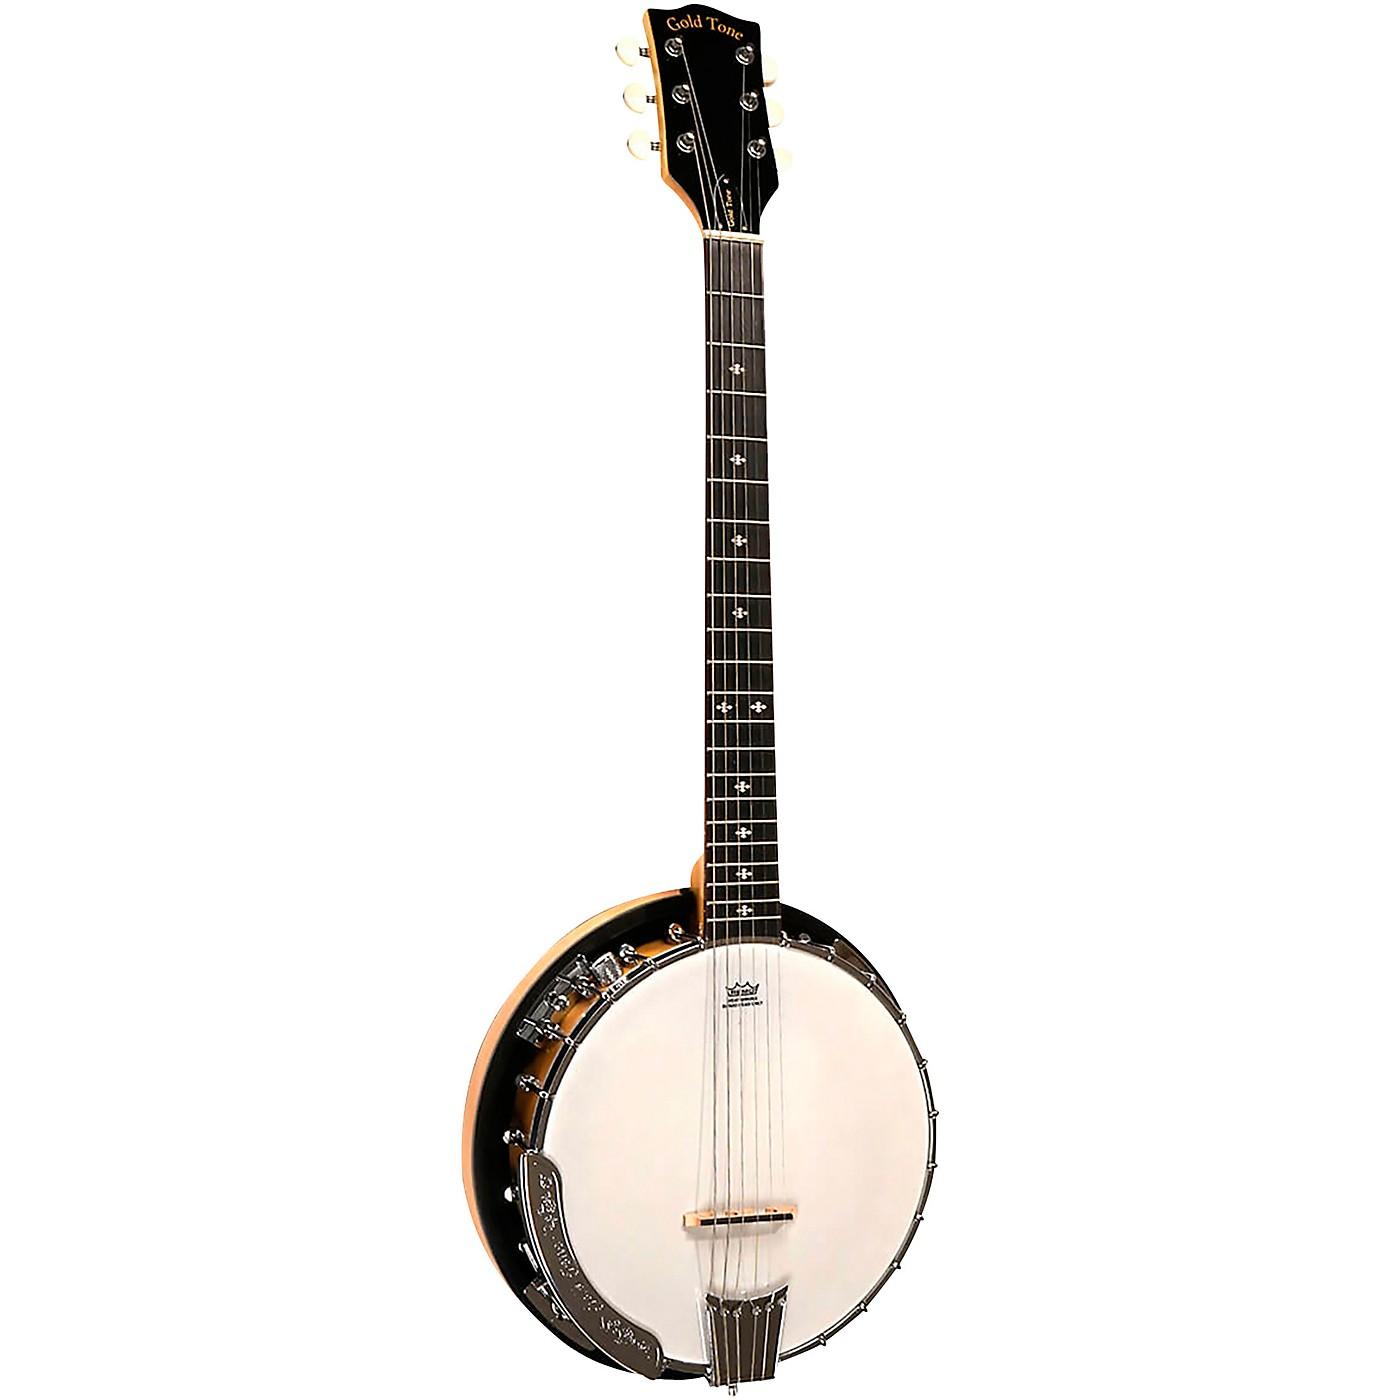 Gold Tone GT-500 Banjo thumbnail